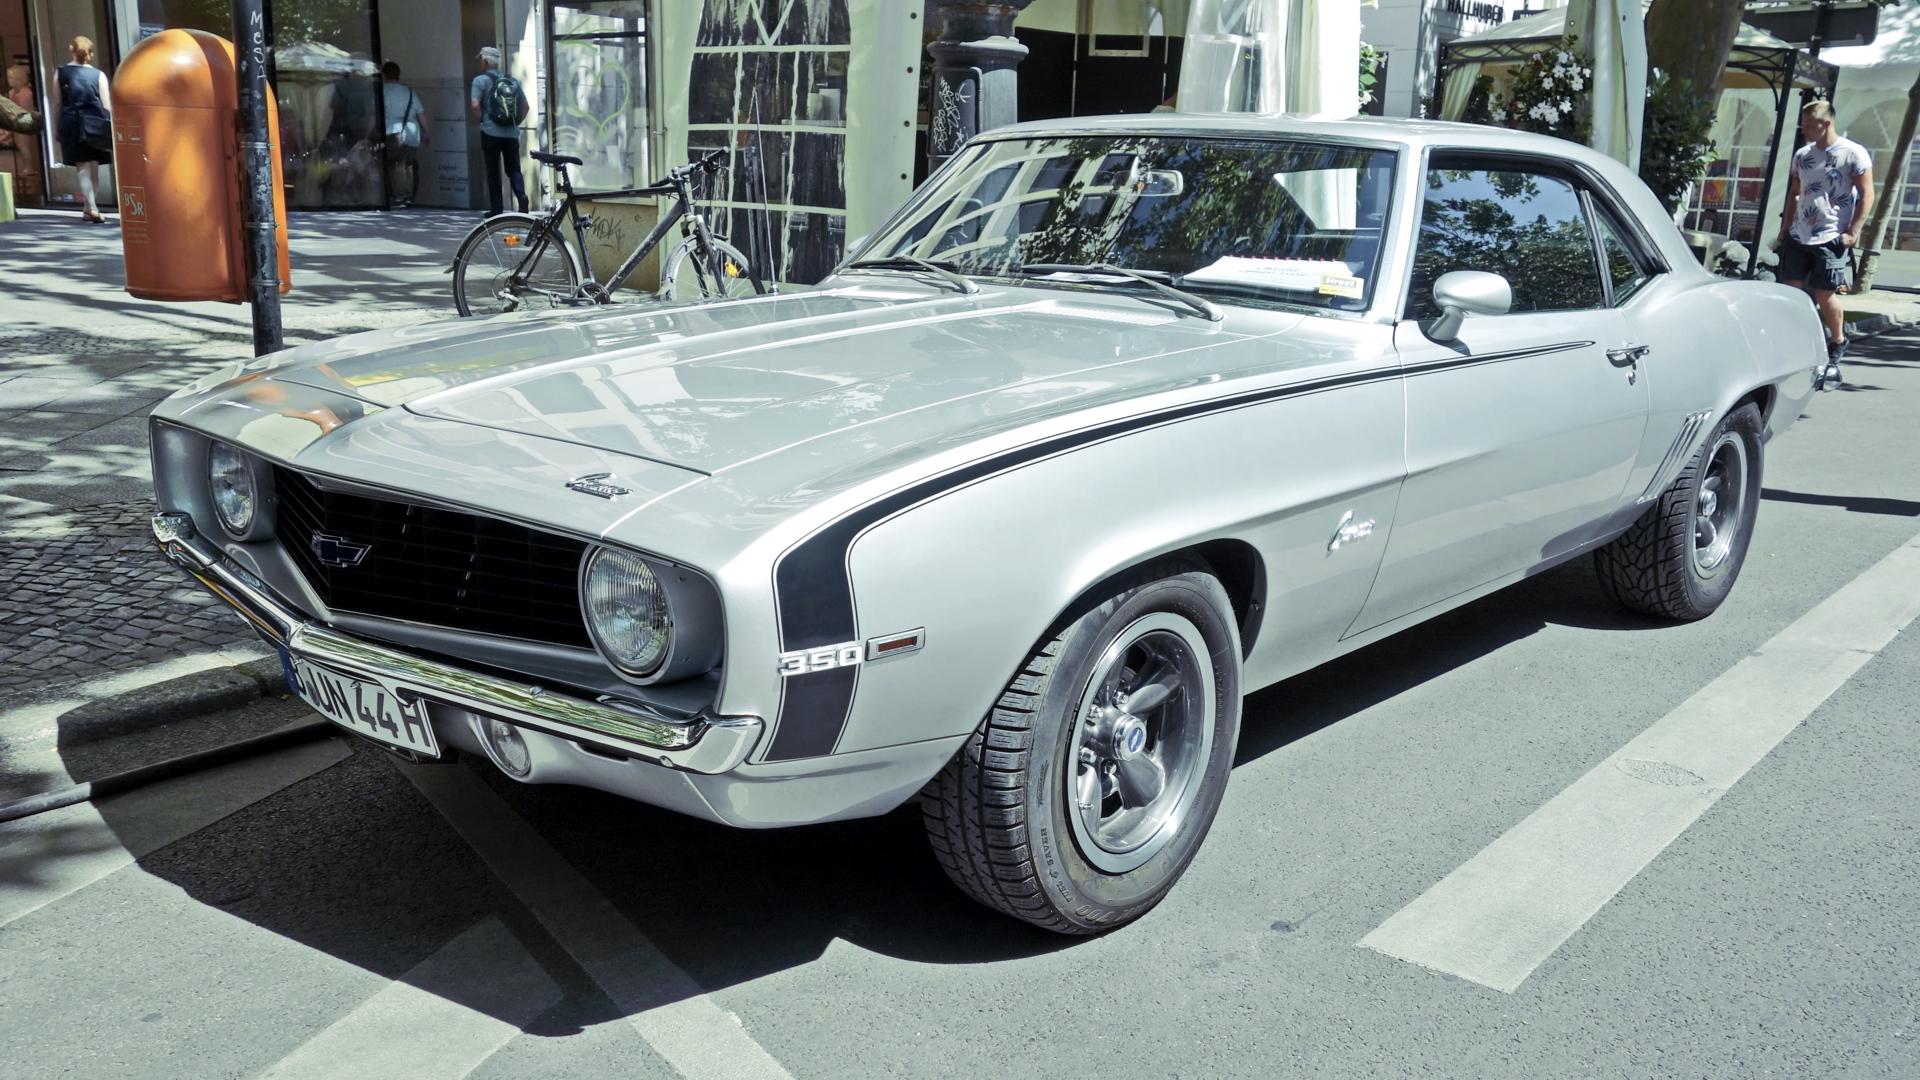 Kelebihan Kekurangan Chevrolet Camaro Ss 1969 Murah Berkualitas